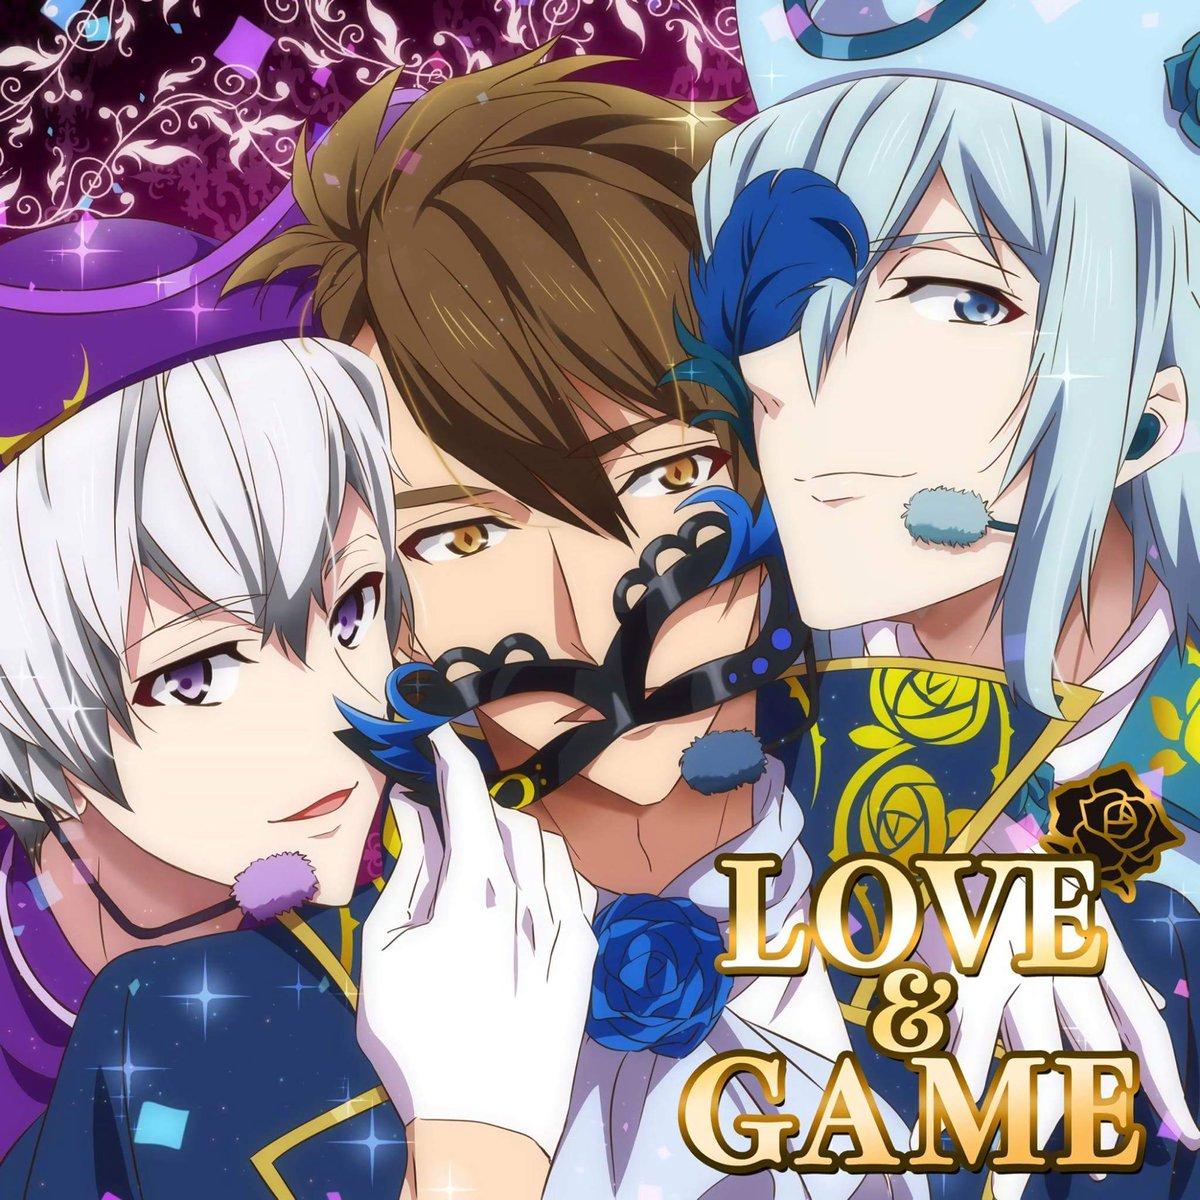 IDOLiSH7 – LOVE&GAME (Single)